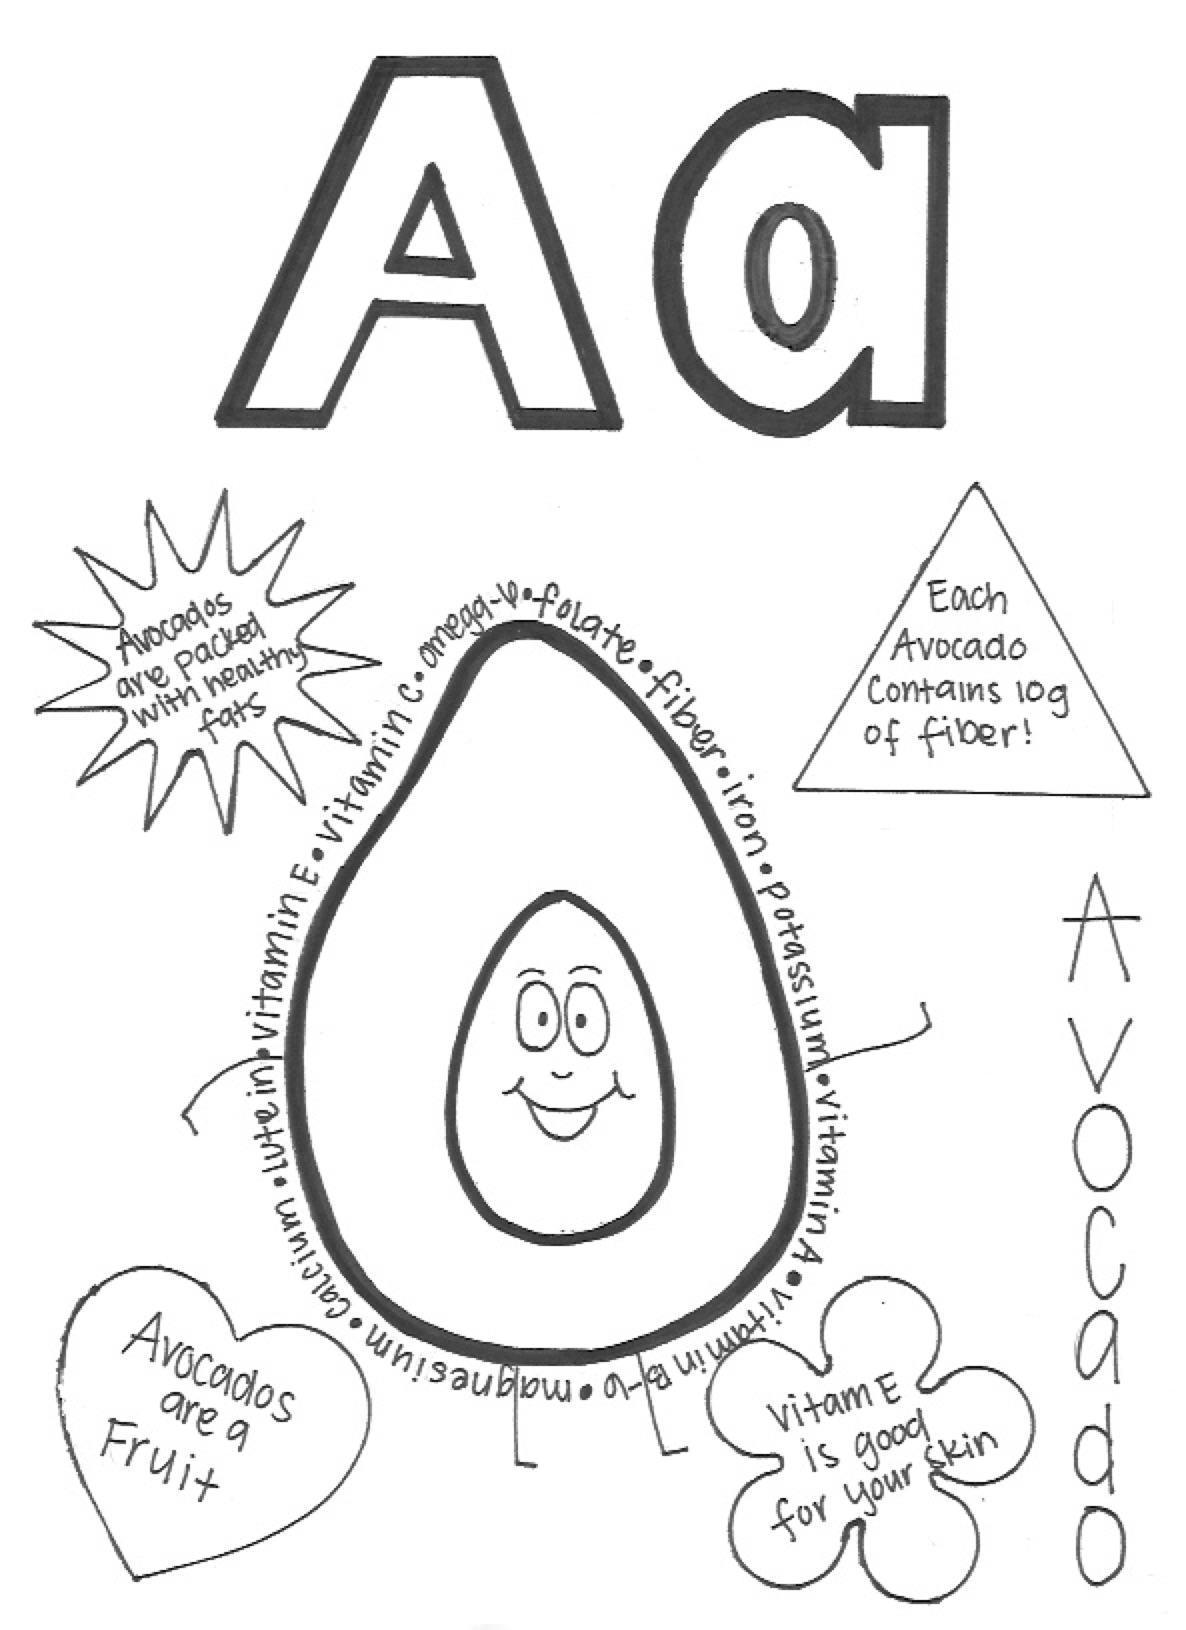 A- Avocado coloring page